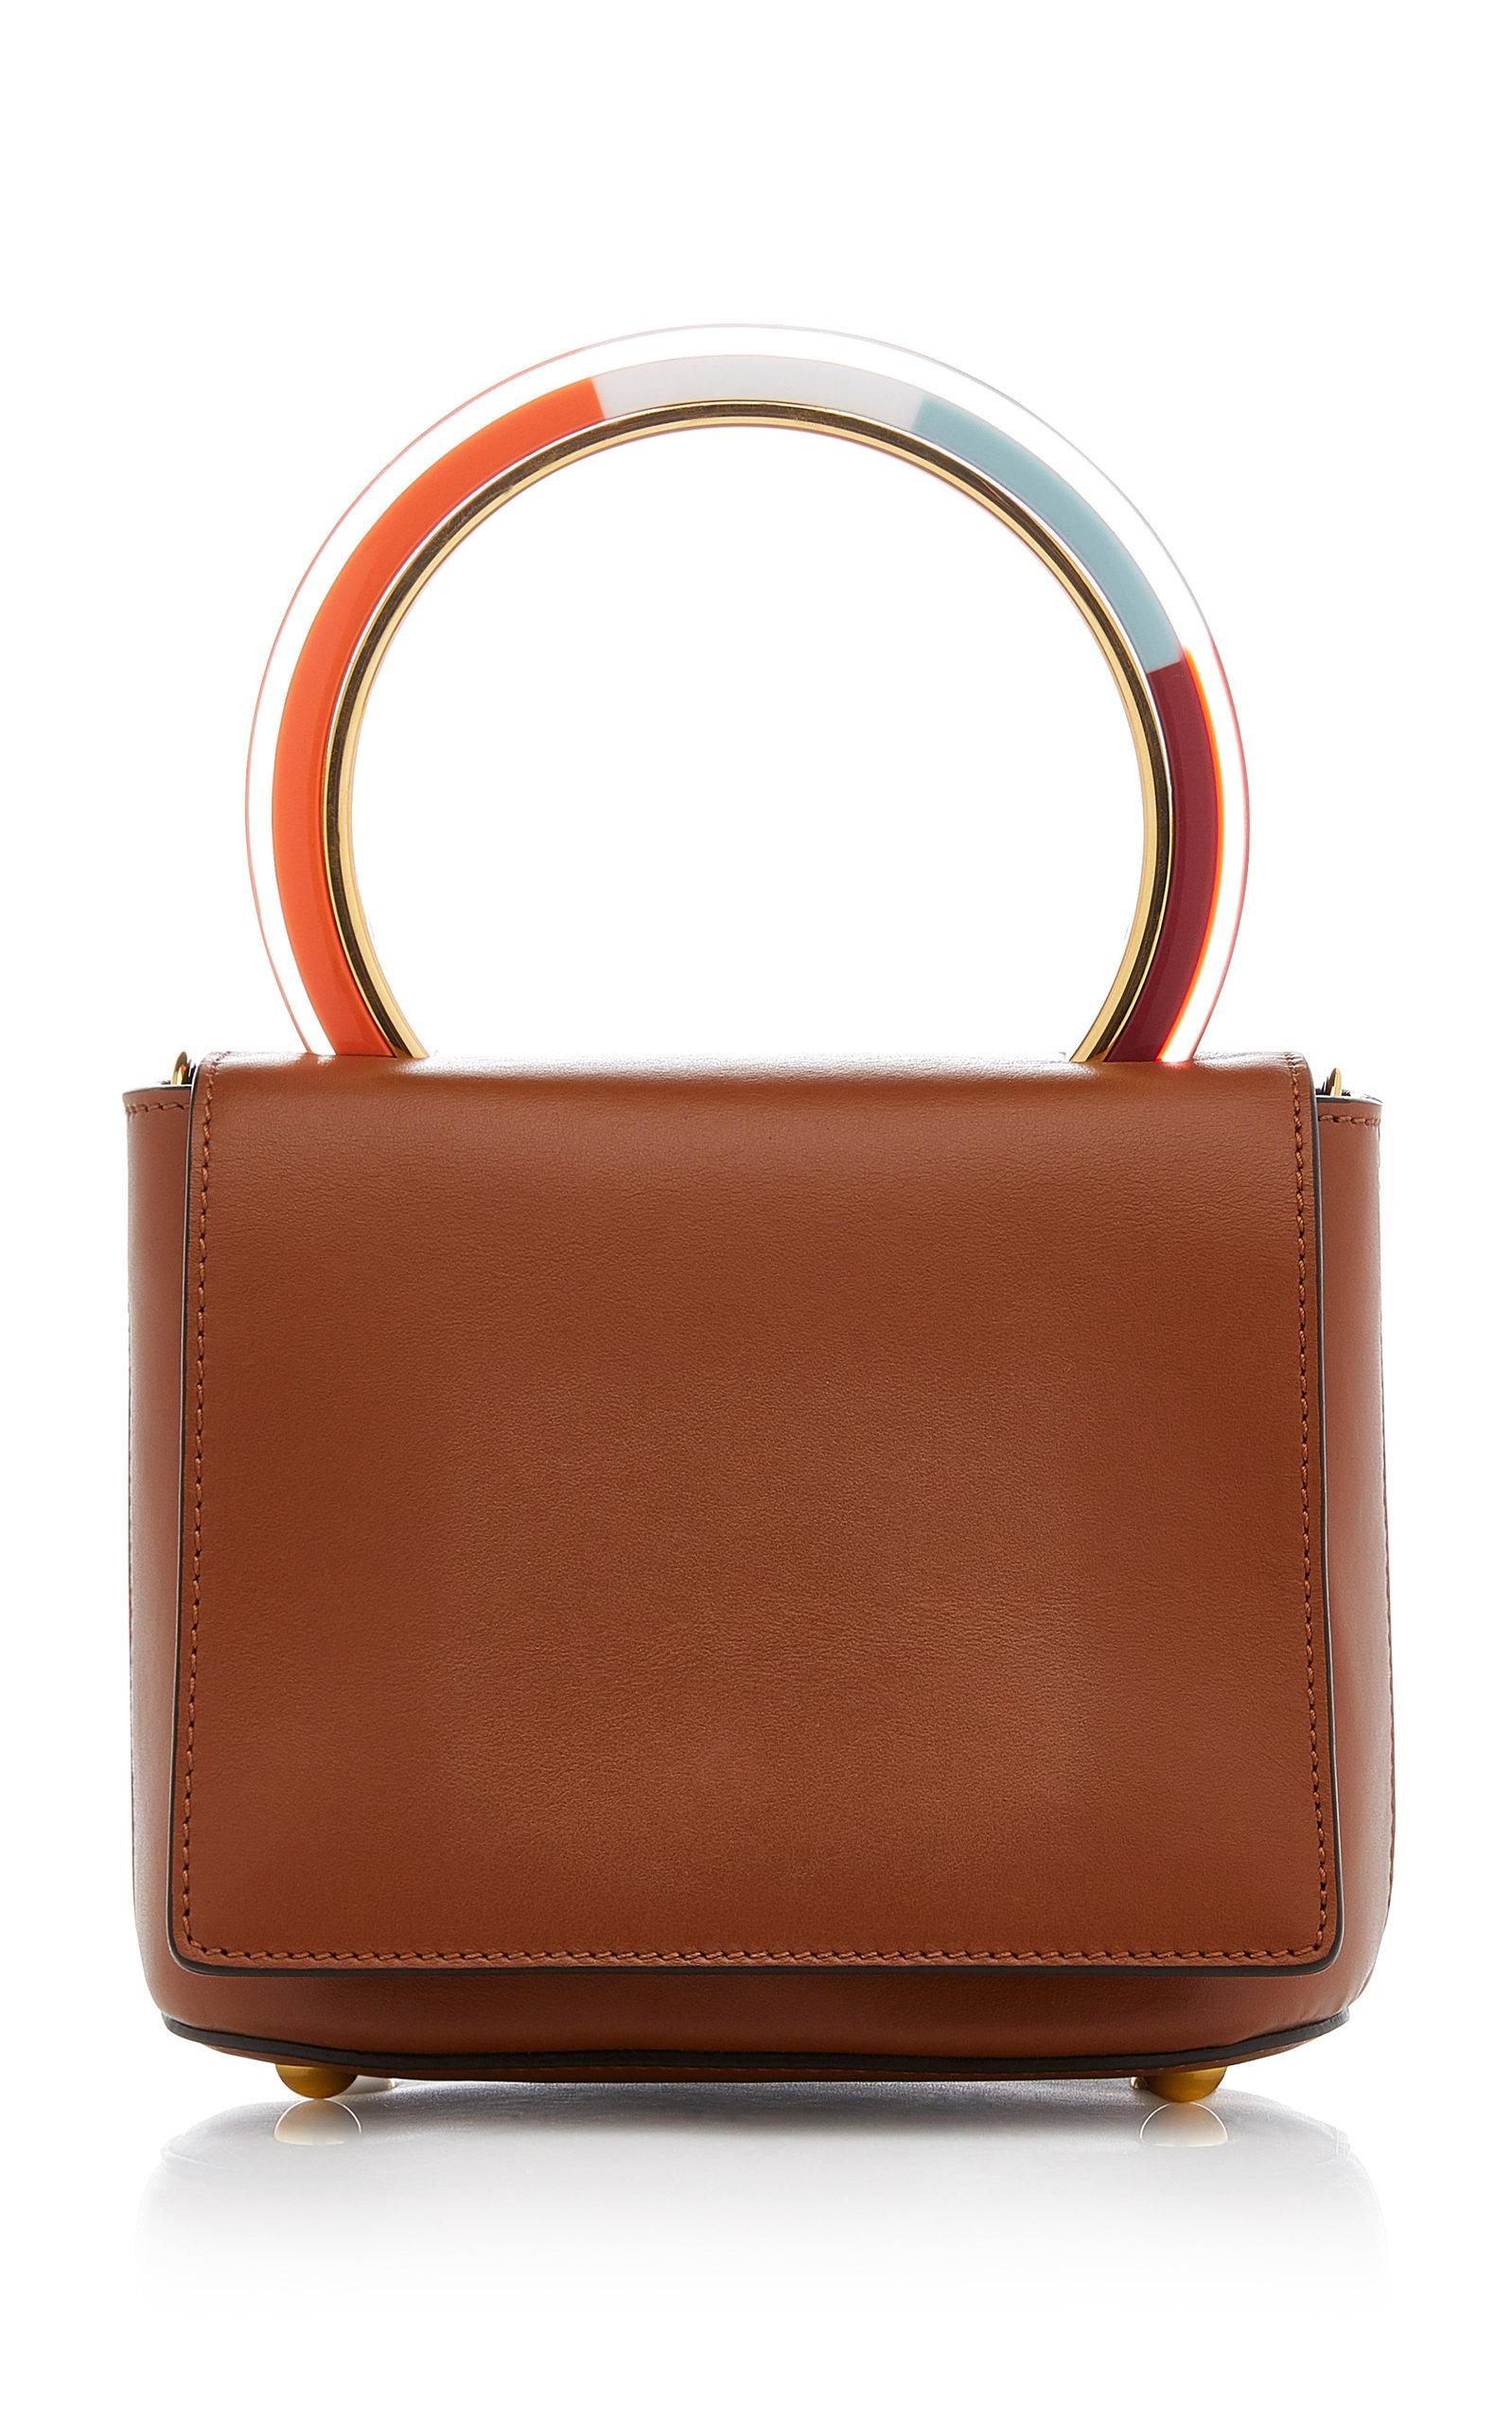 Marni Color-block Top Handle Shoulder Bag In Burgundy